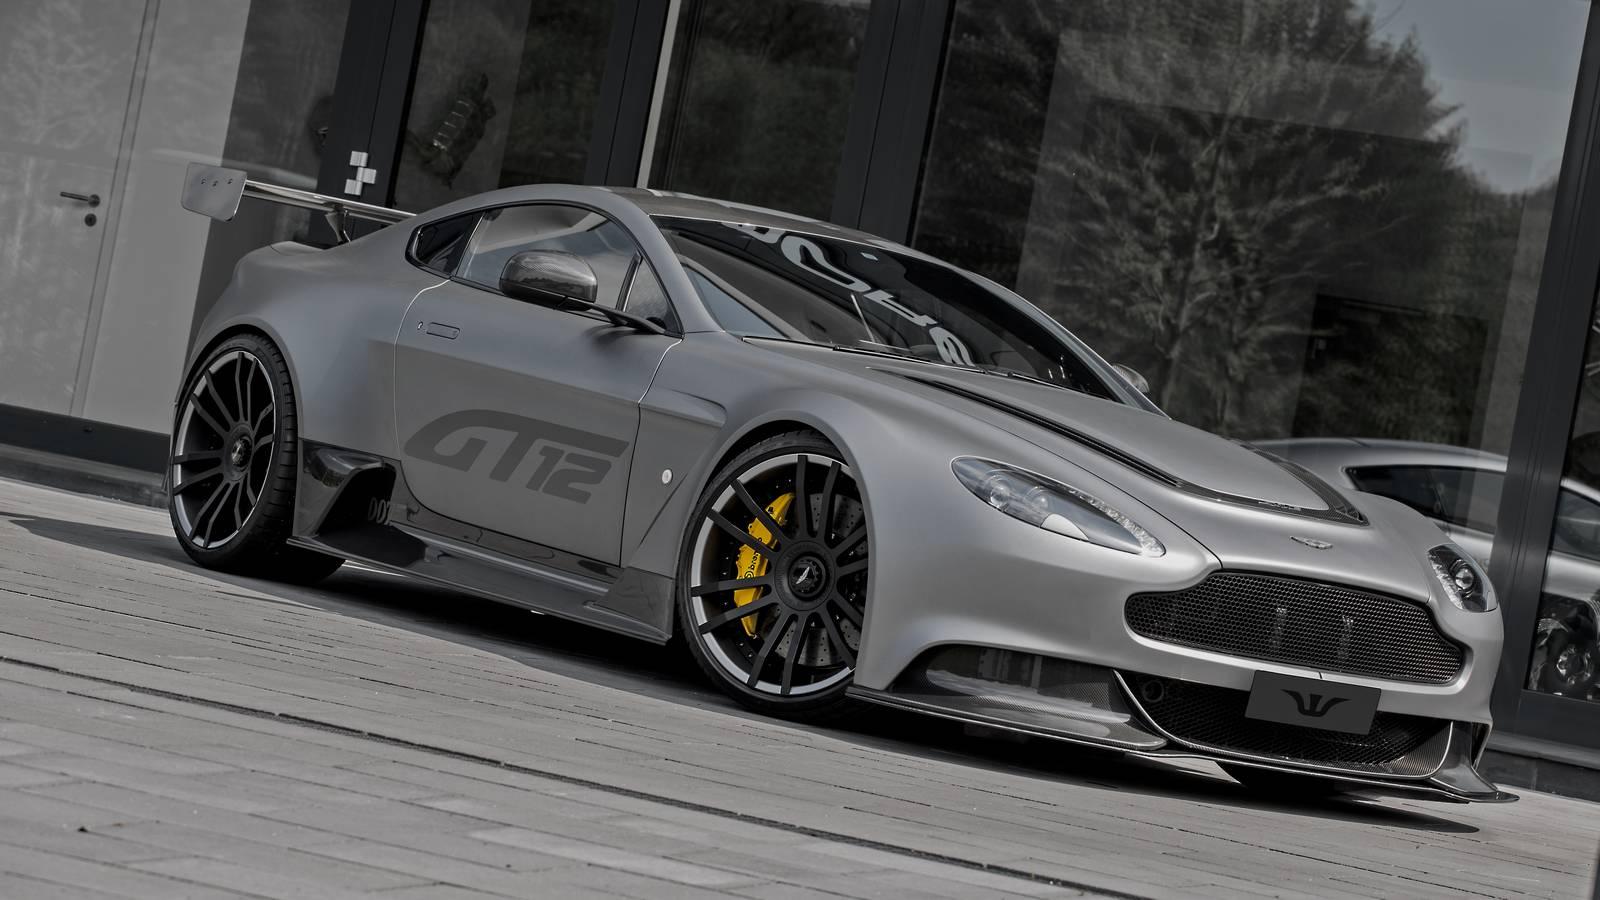 Official Aston Martin Vantage Gt12 By Wheelsandmore Gtspirit